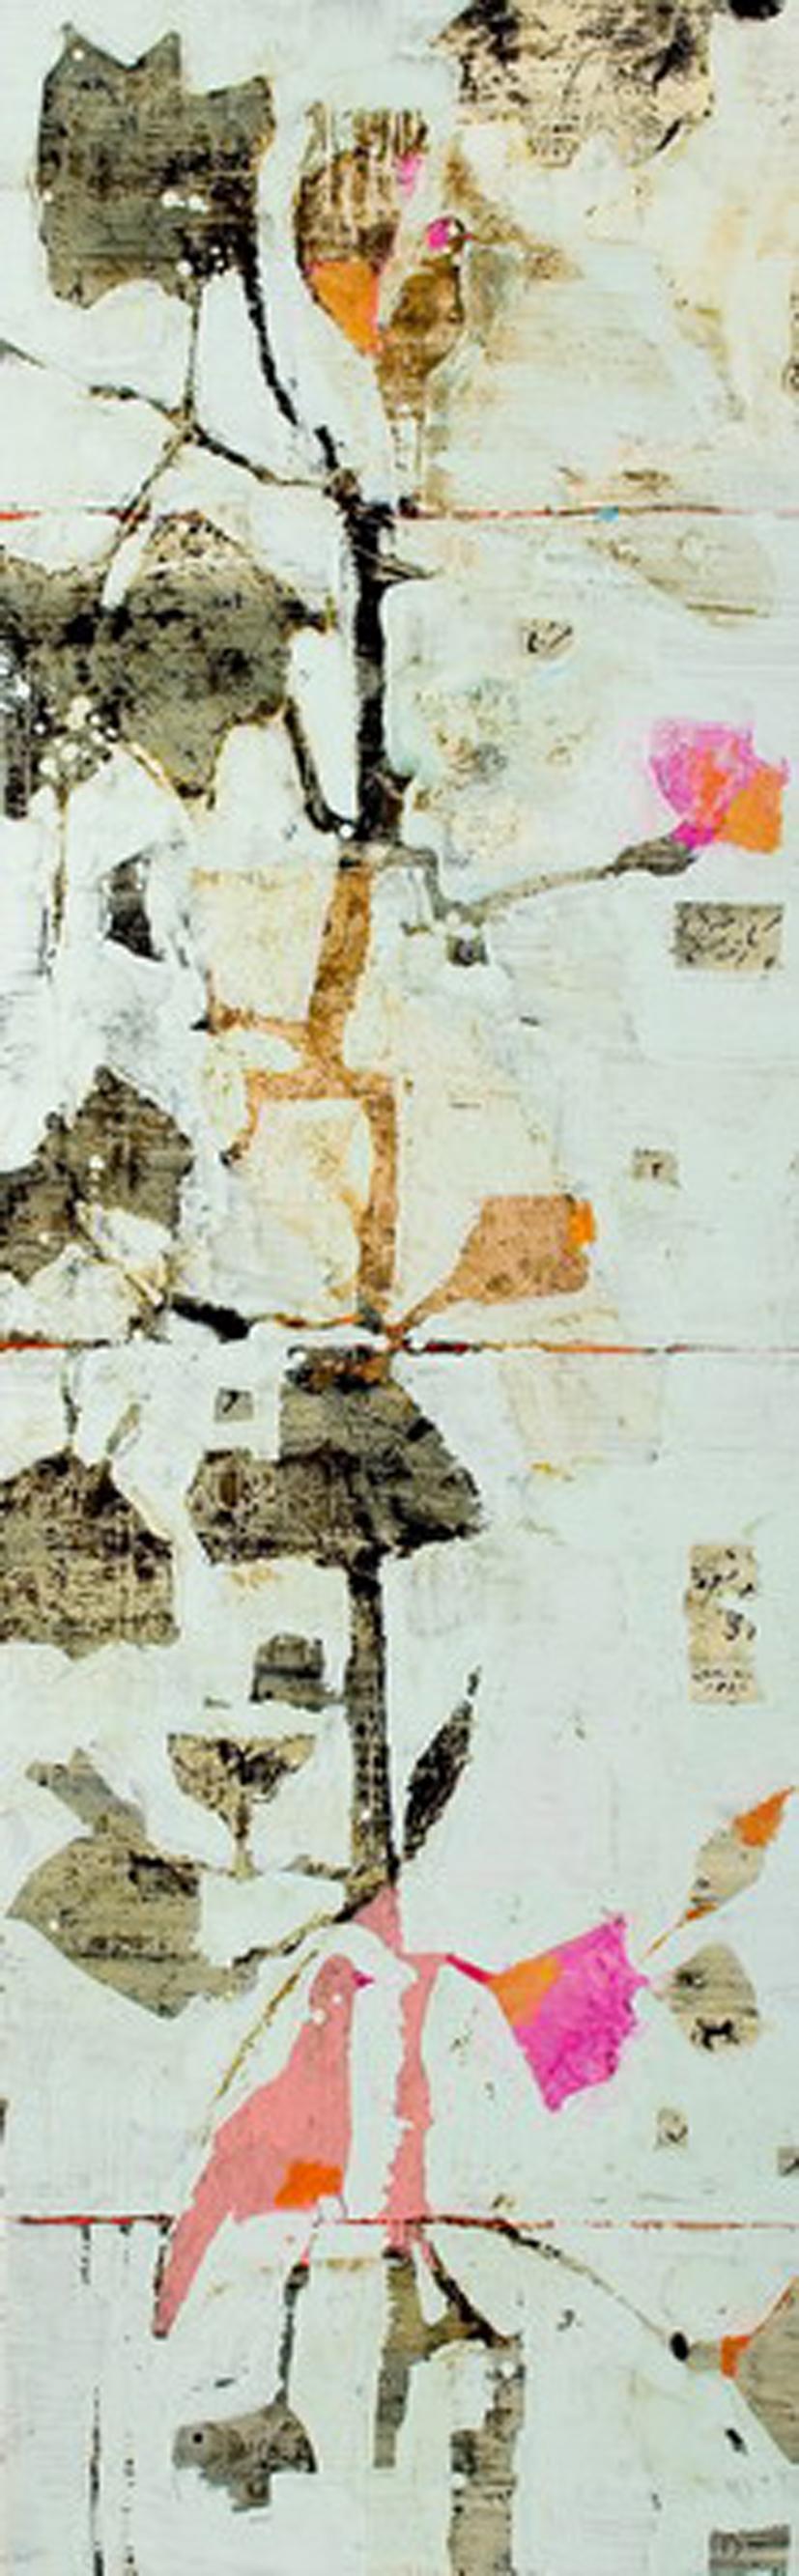 Reza Derakshani - Flower and Bird Series, Mixed Media on Canvas, 270x85cm, 2009, 35000 dollars.jpg